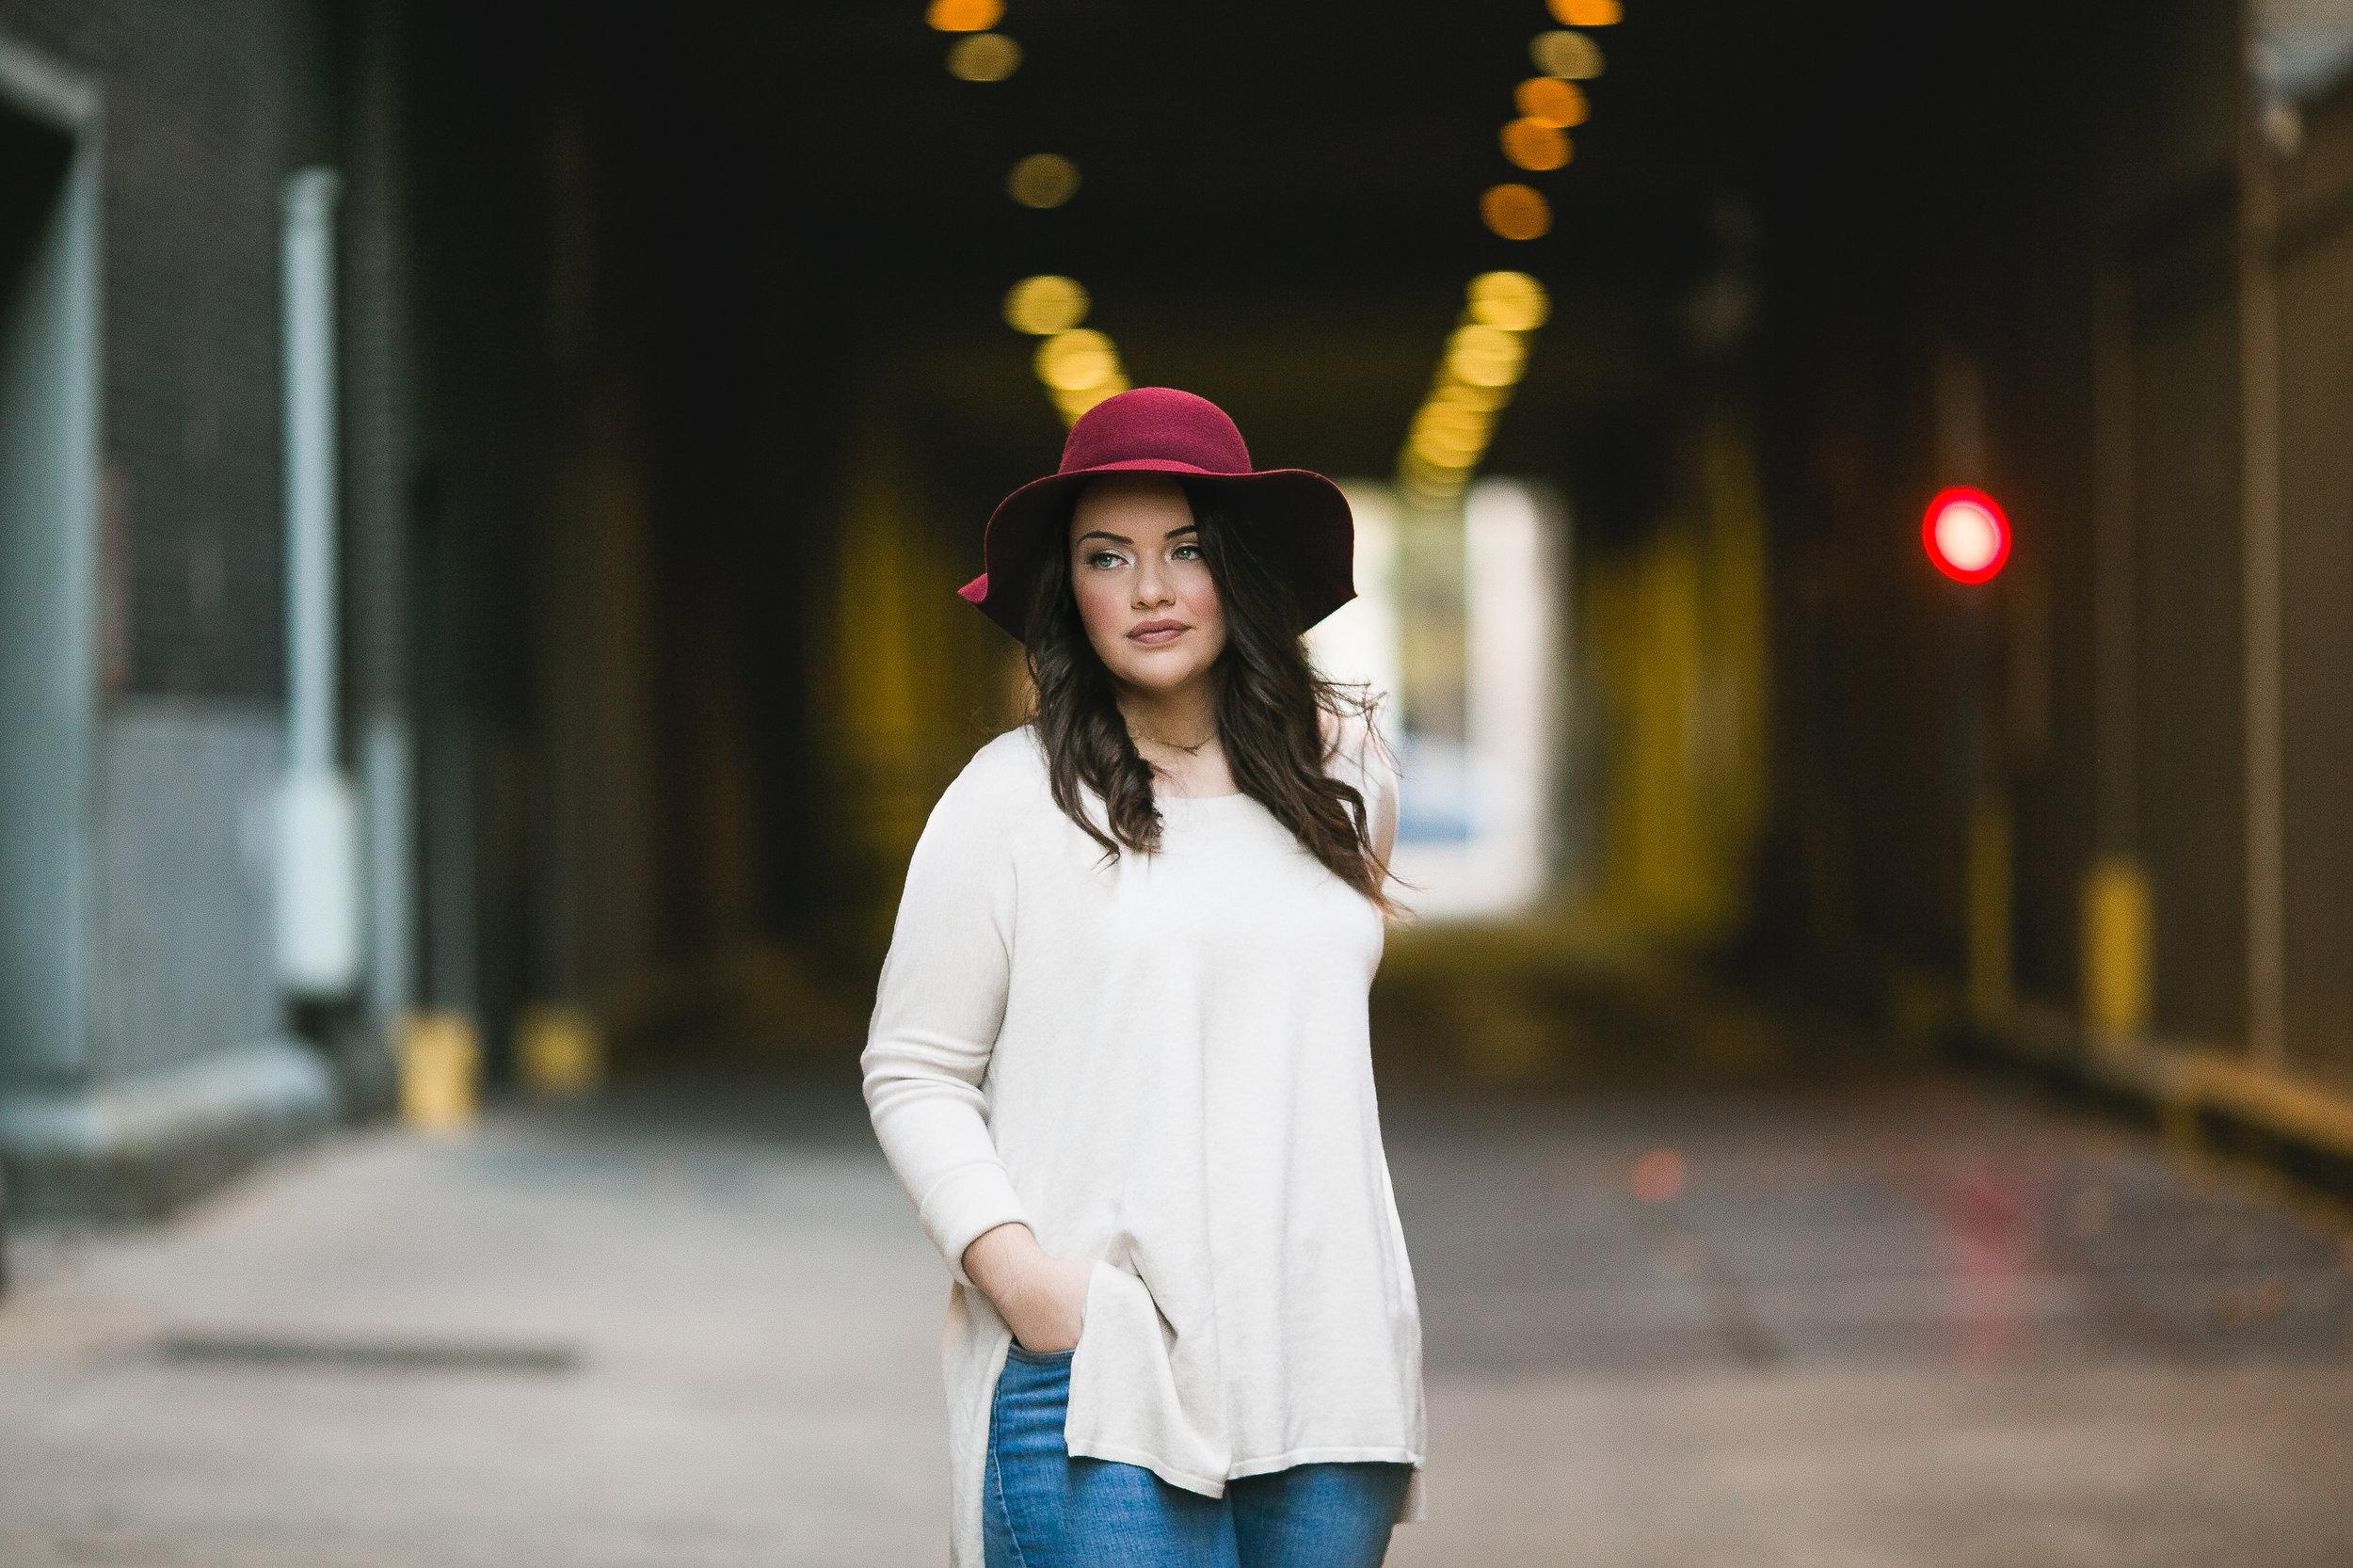 norman senior photographer sulphur senior session downtown okc oklahoma city session hat